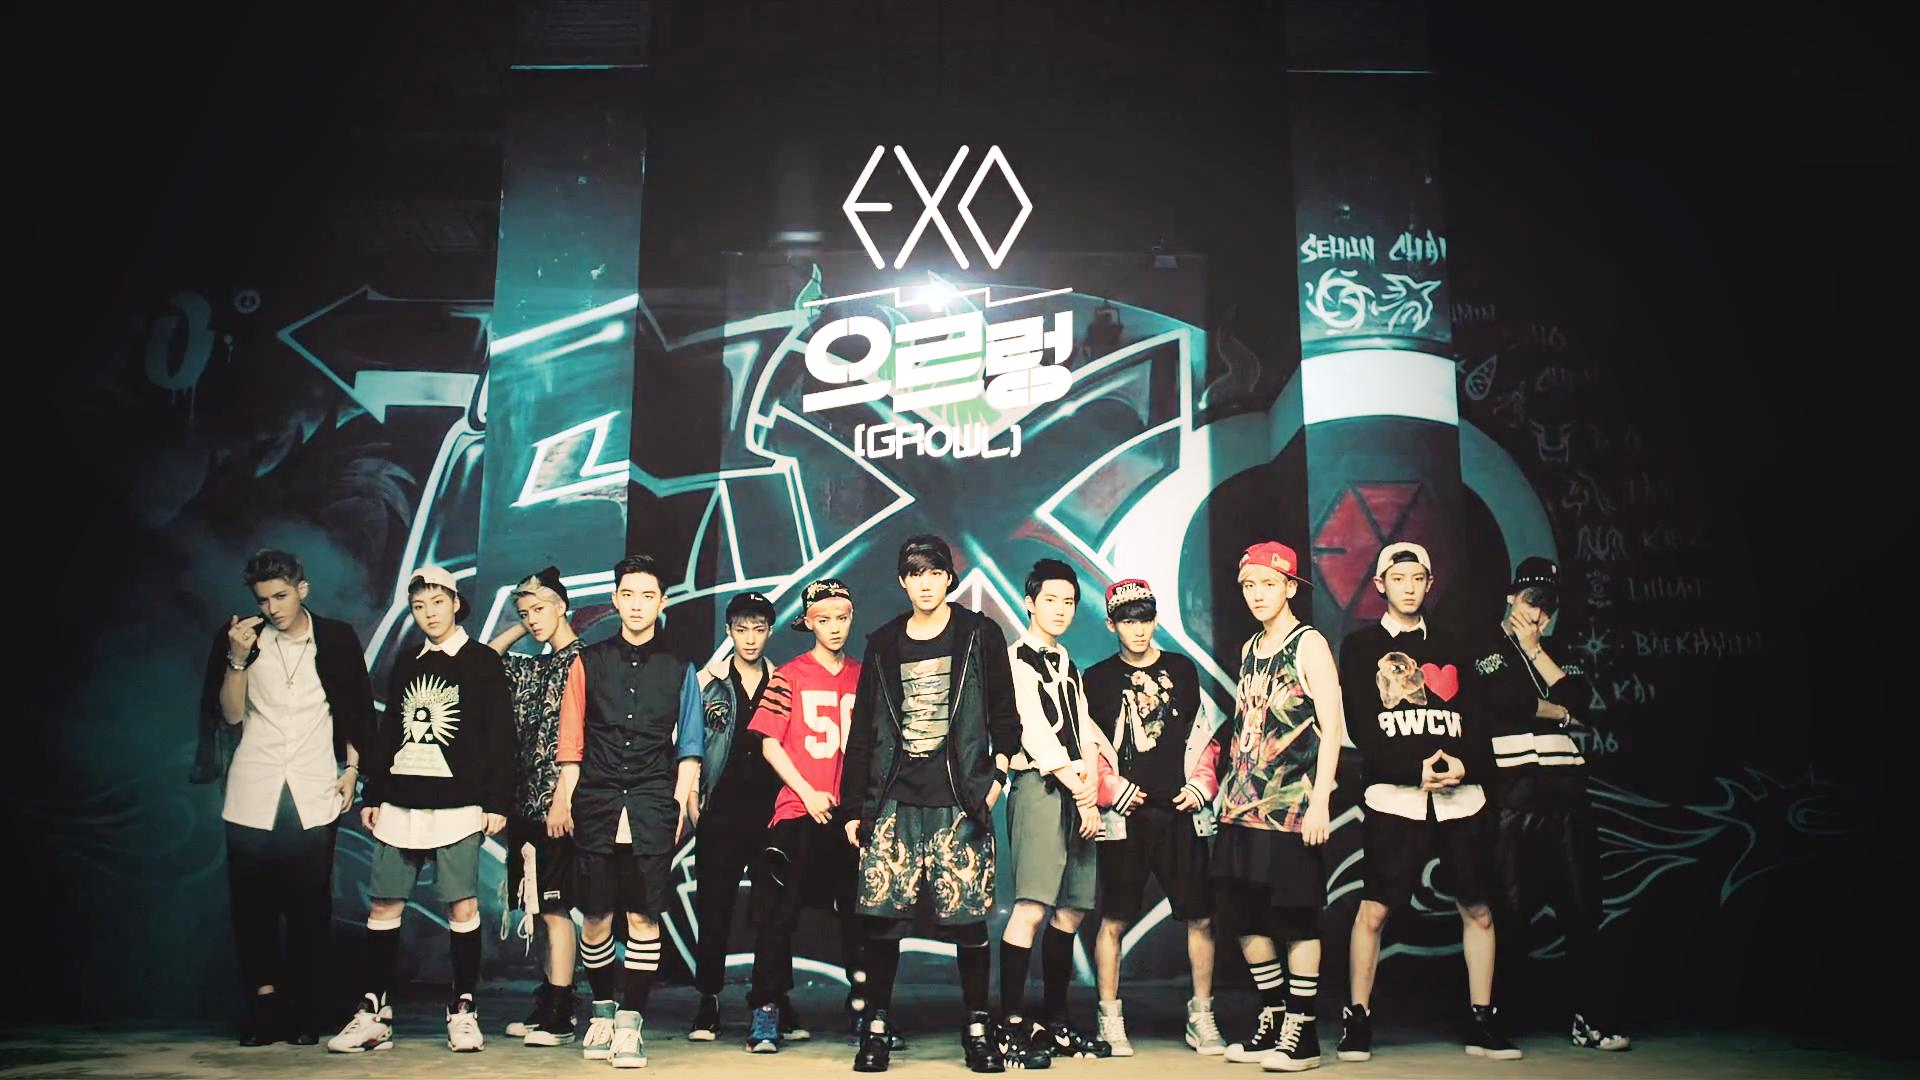 EXO Growl Wallpaper Photos Background 2013 [ EXOs Fansigning wegen 1920x1080